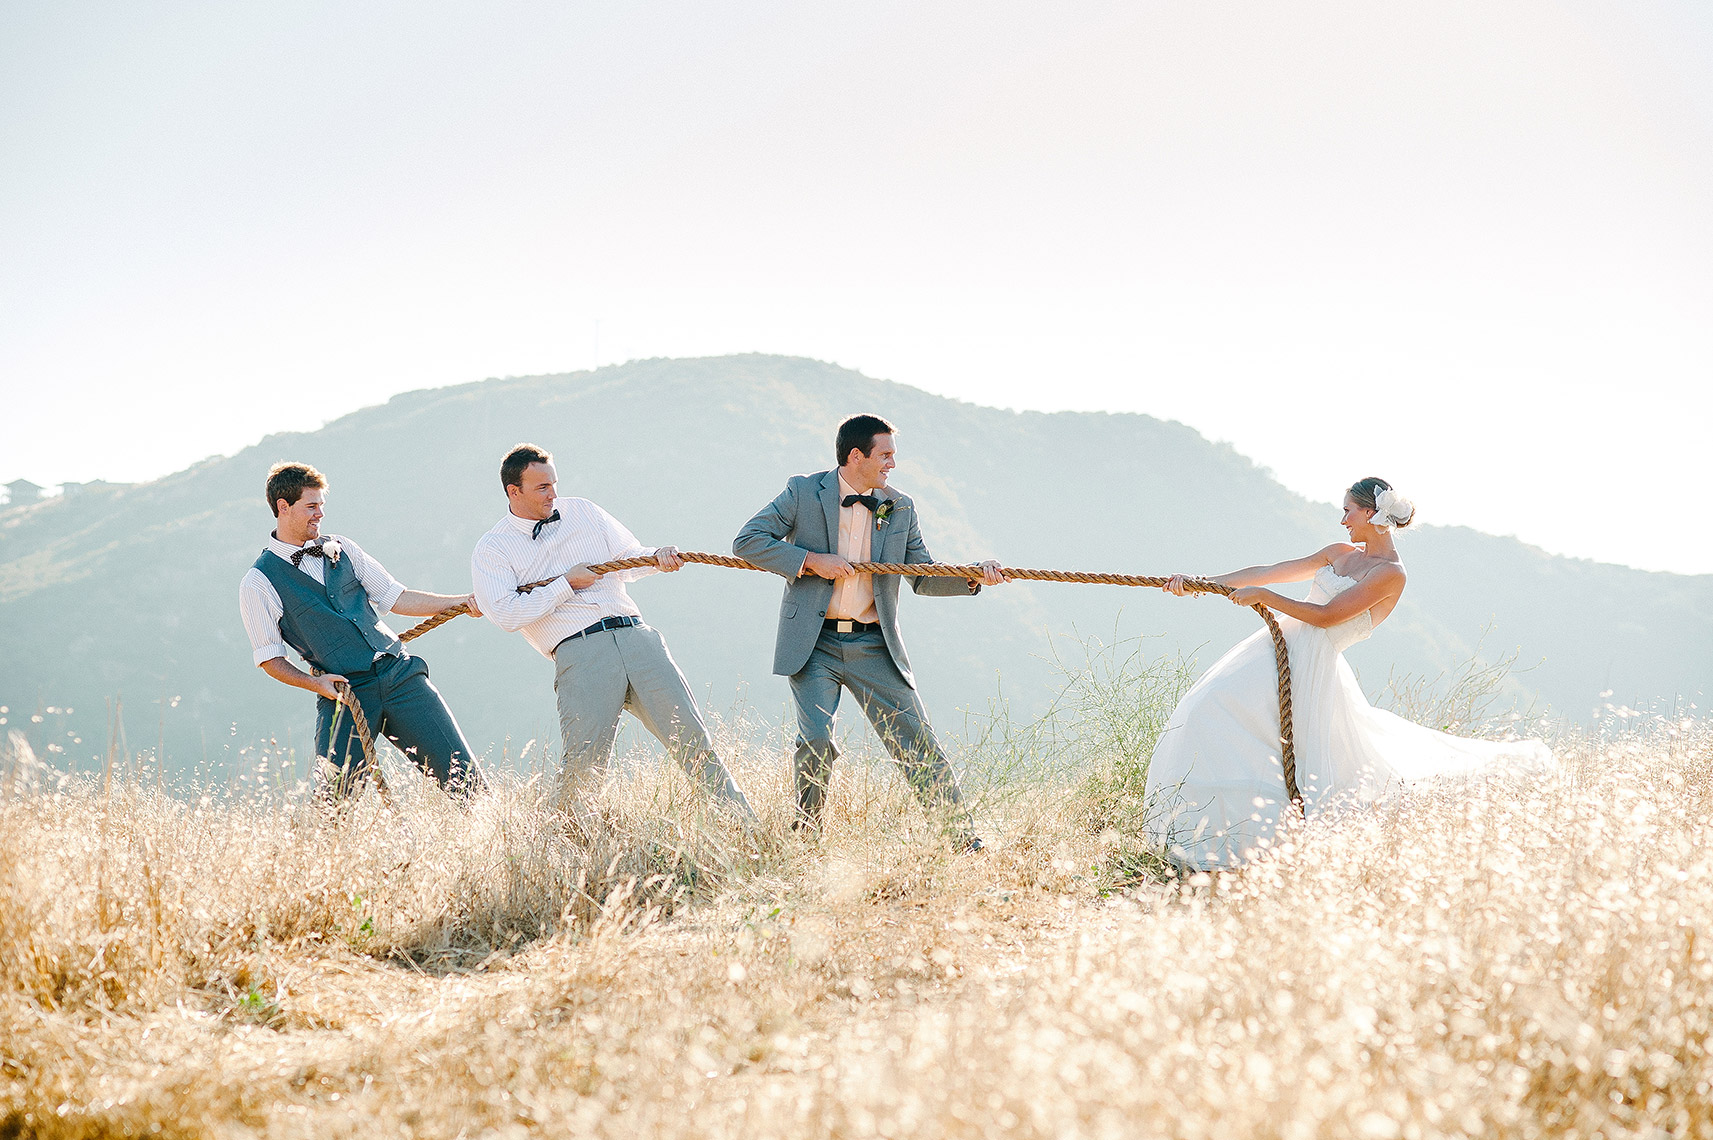 john-schnack-photography-san-diego-wedding-inspiration-shoot-back-country-vintage-wedding-41.jpg